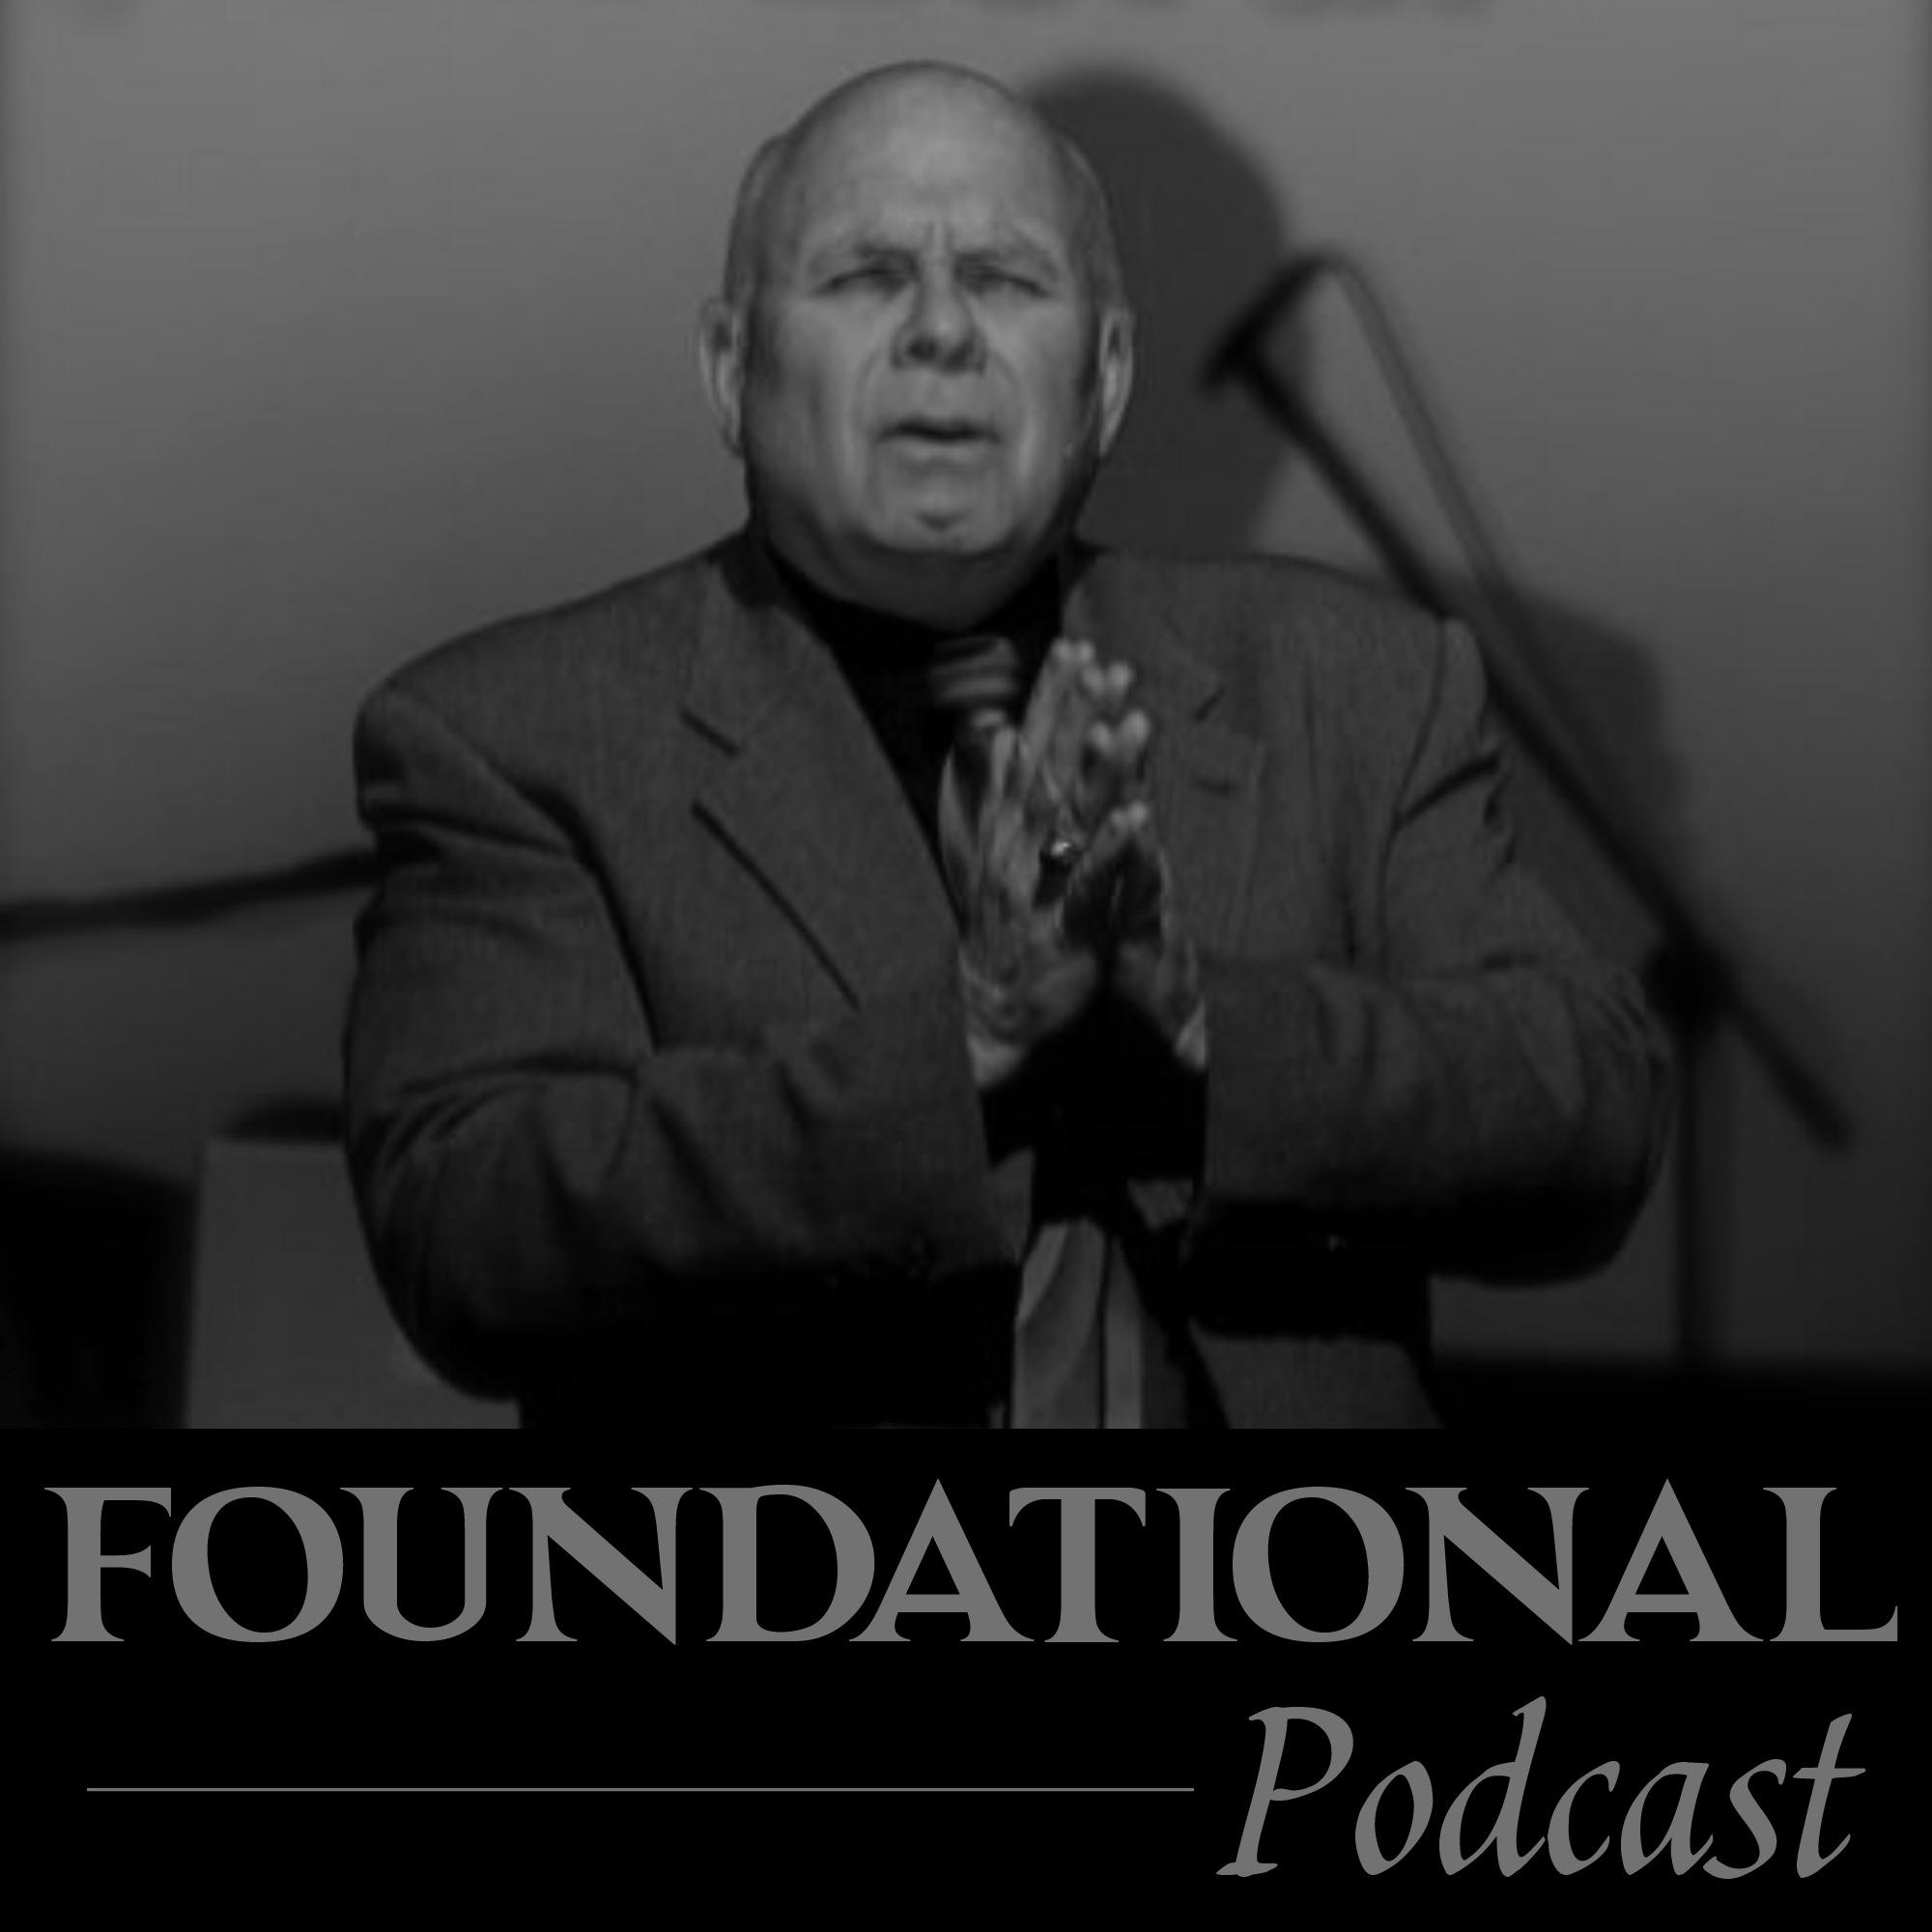 Foundational Podcast